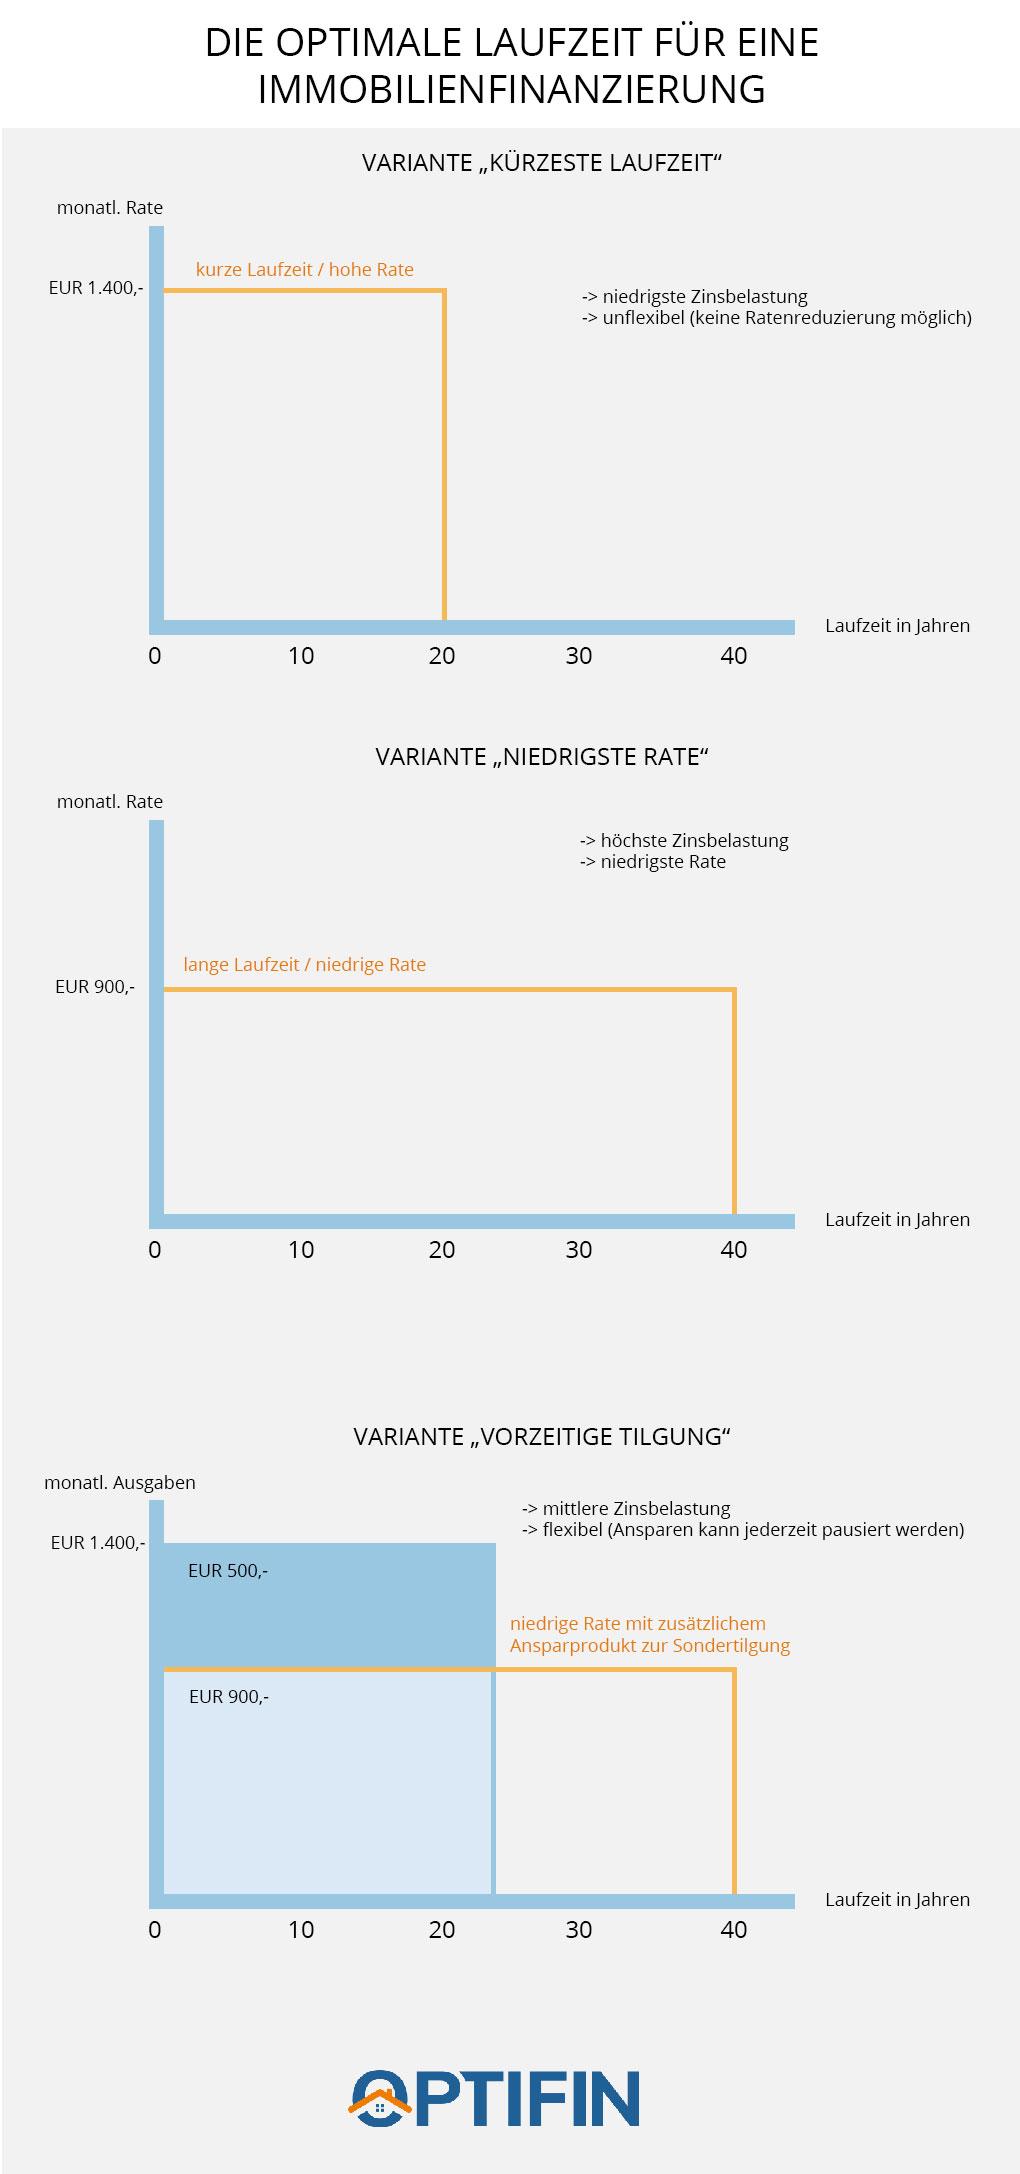 laufzeit-infografik